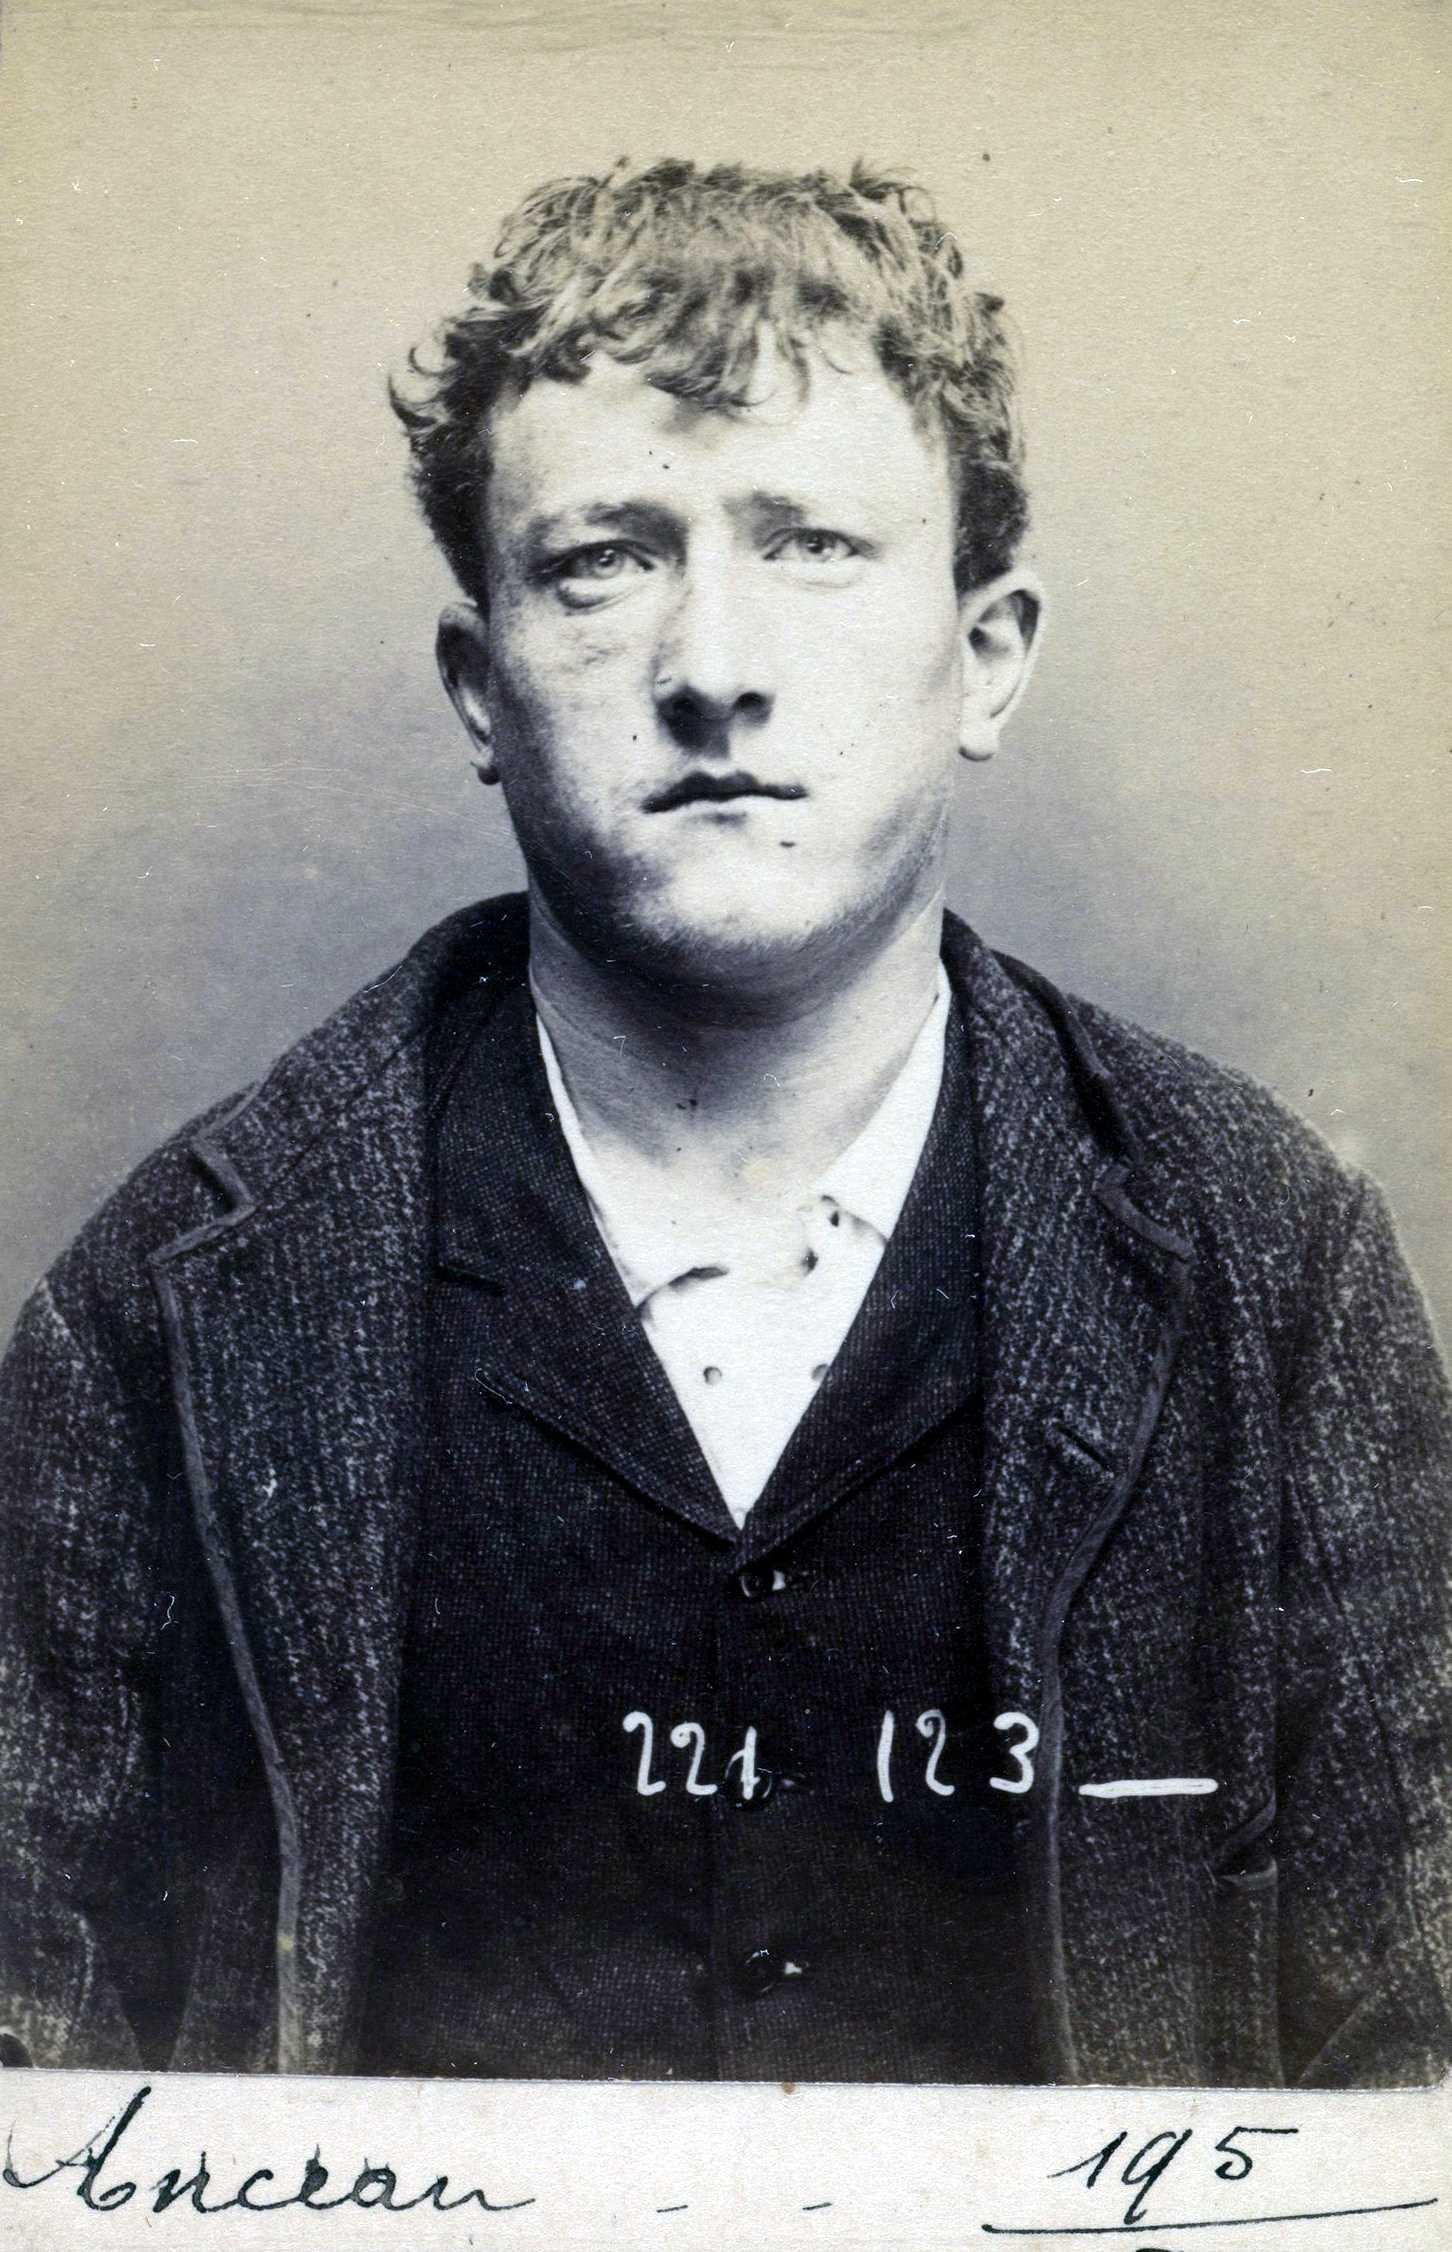 Foto policíaca d'Aimé Anceau (17 de juliol de 1894)